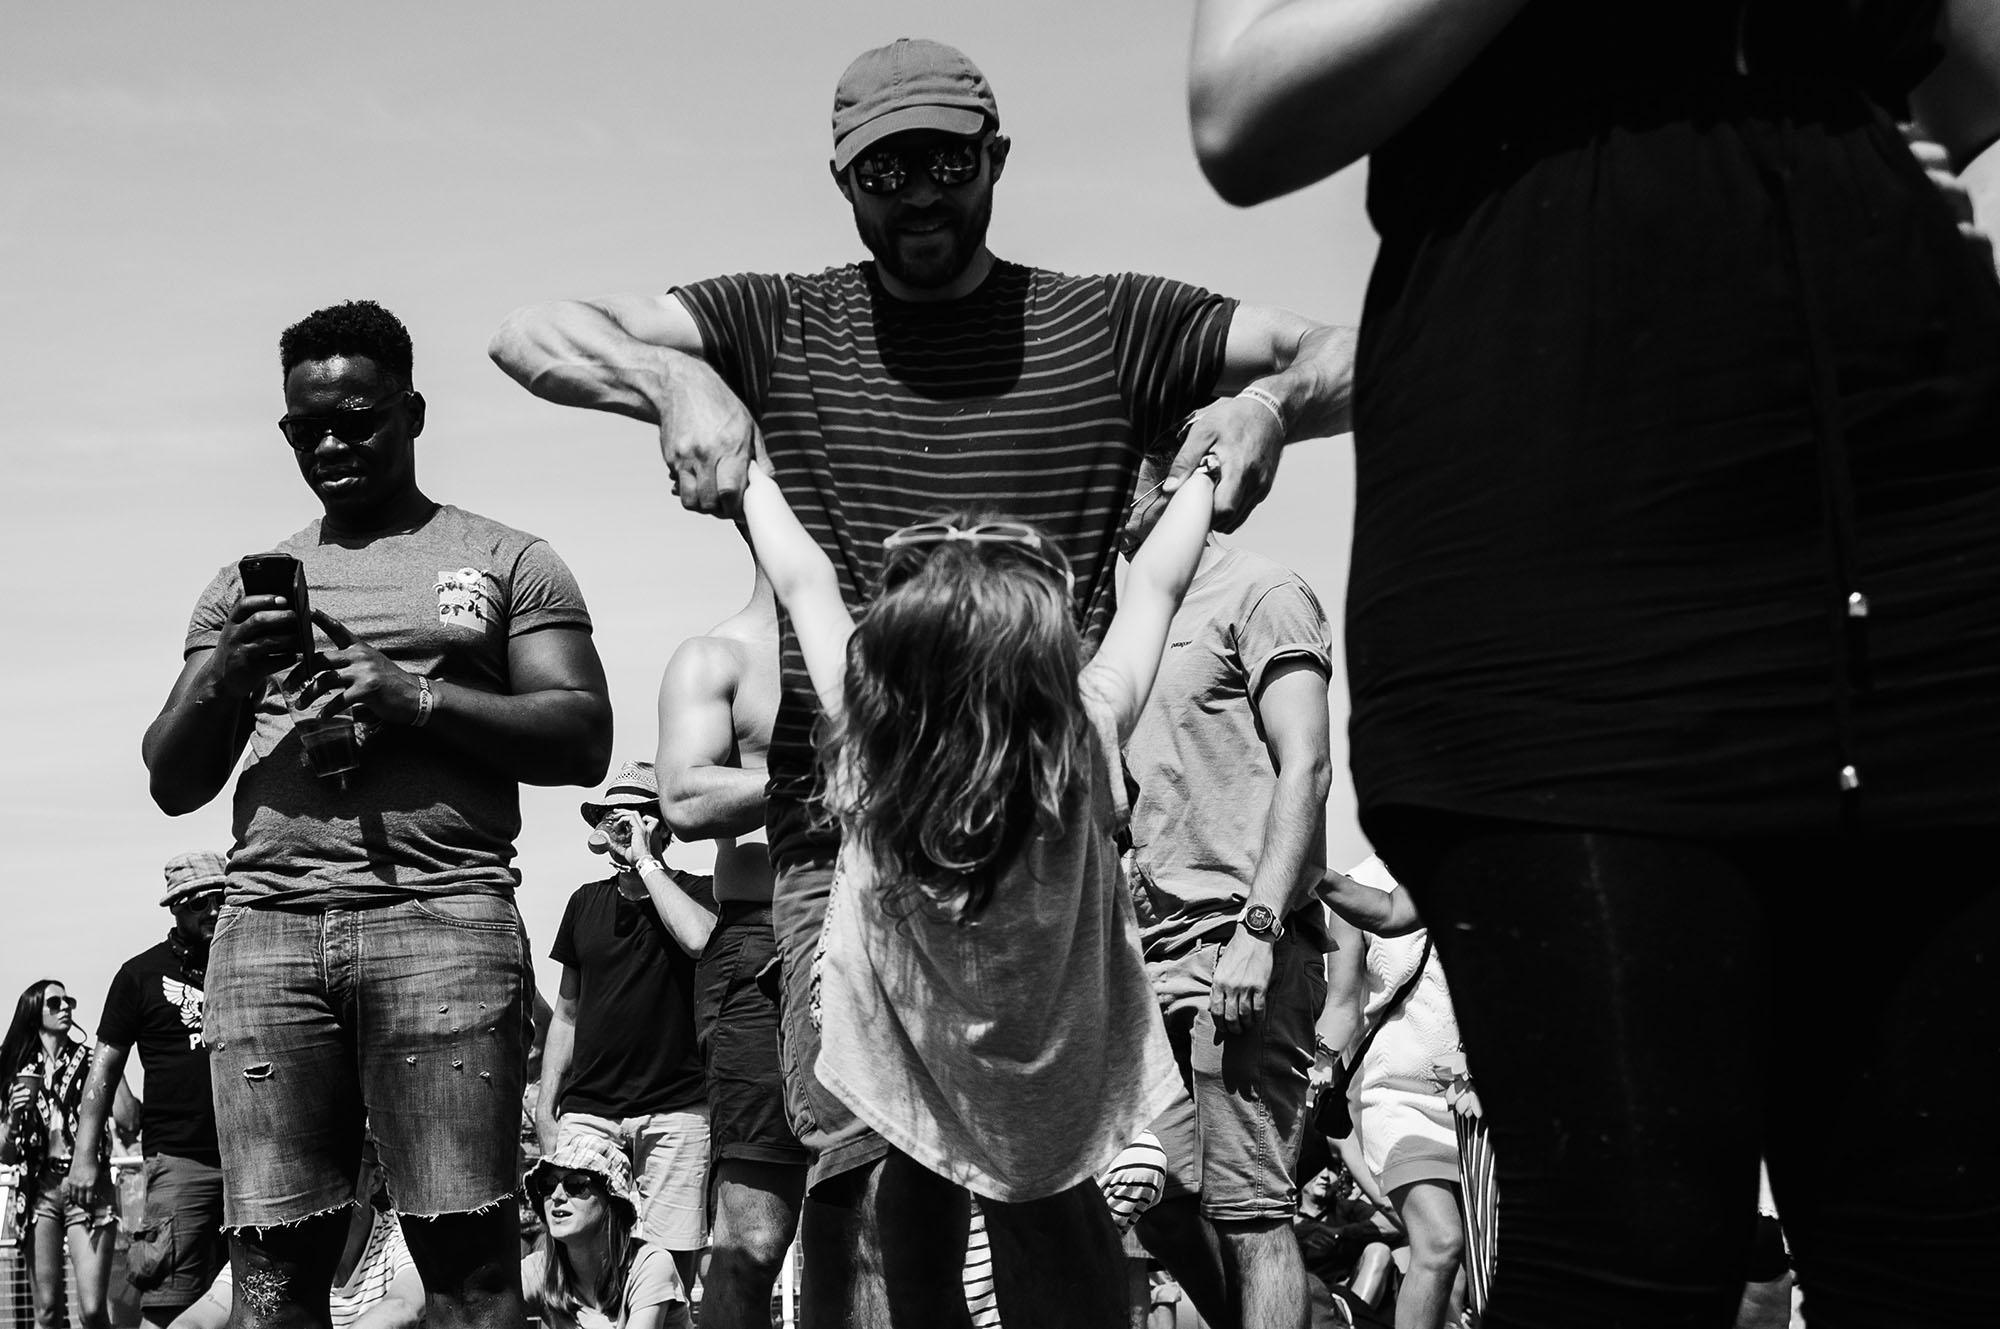 music festival documentary photography